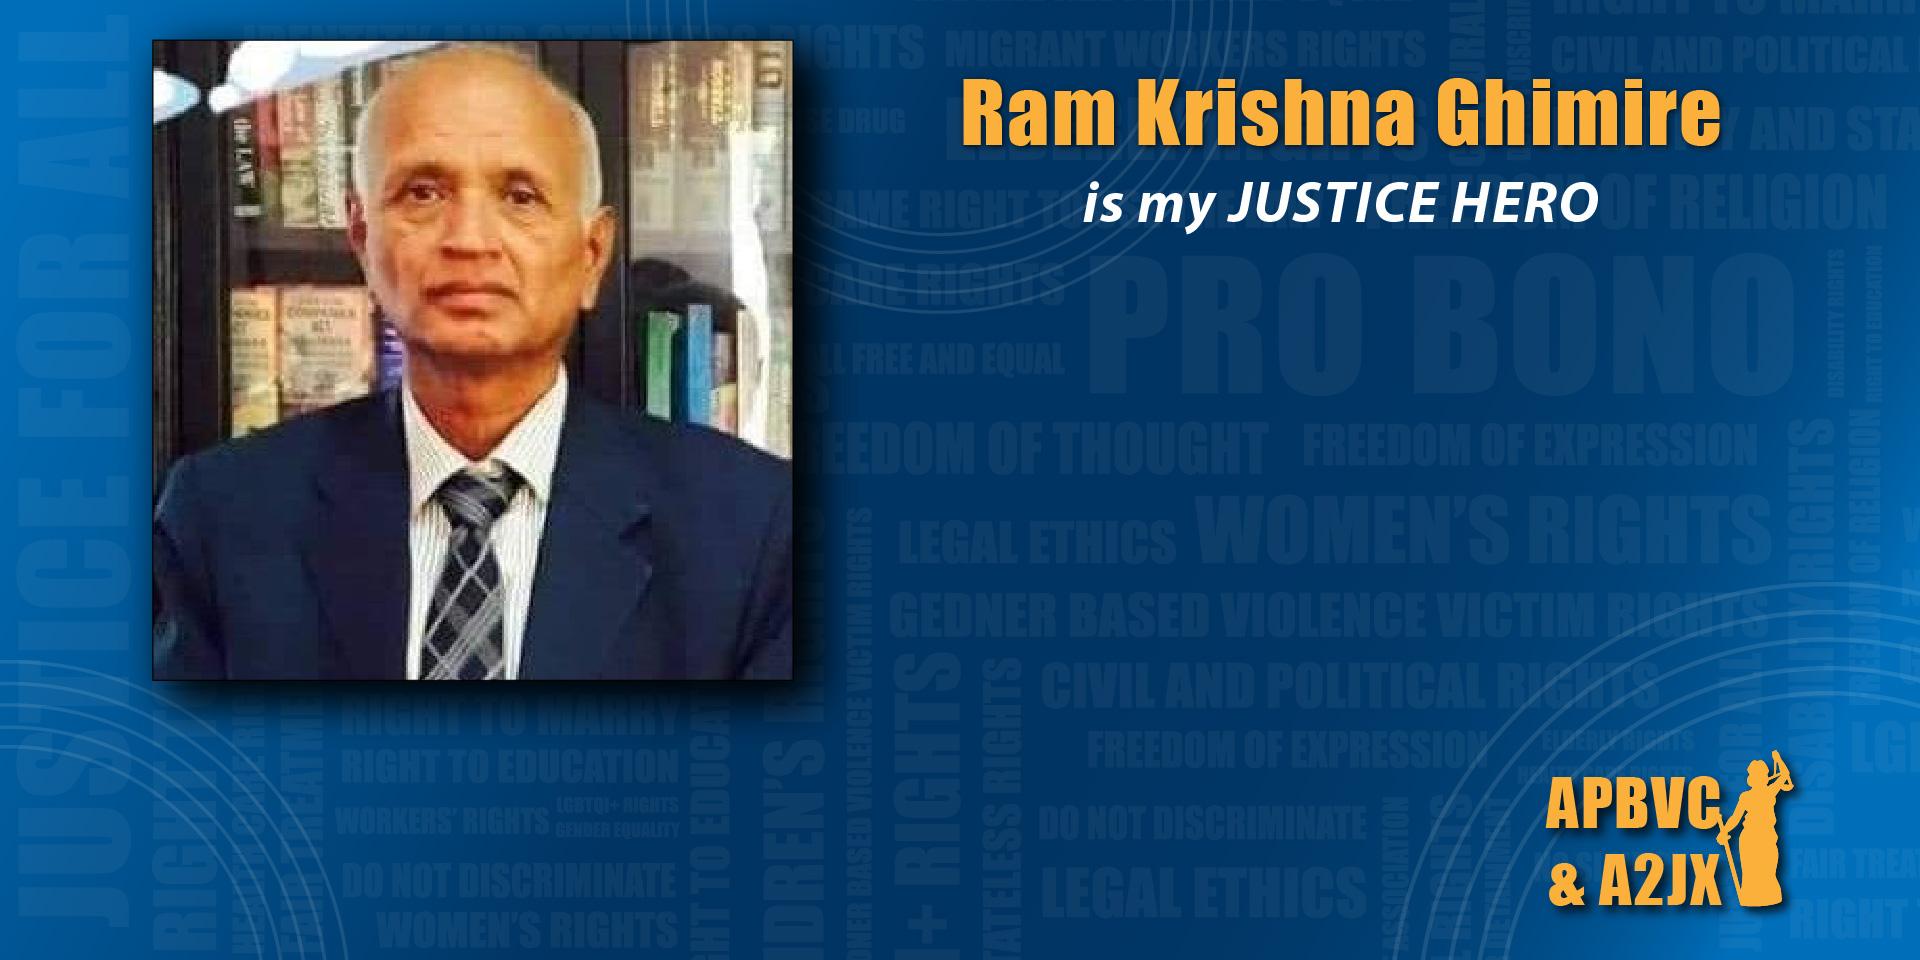 Ram Krishna Ghimire